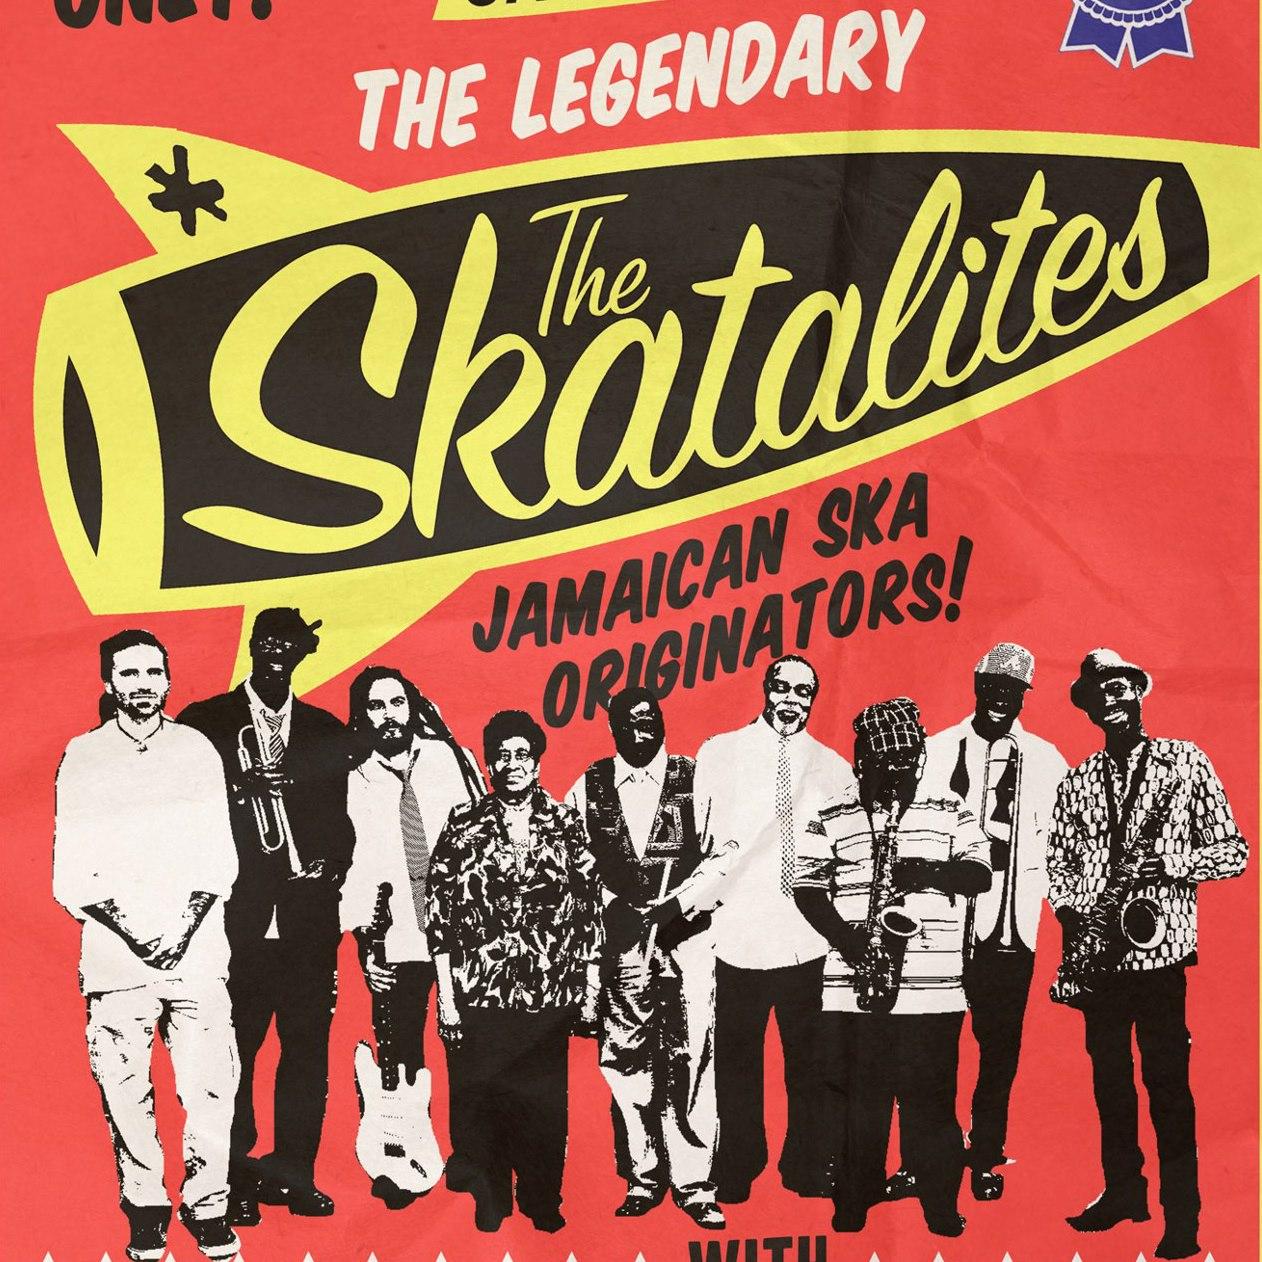 The Skatalites The Ska-Talites - The Dynamites - Timothy - Gumma